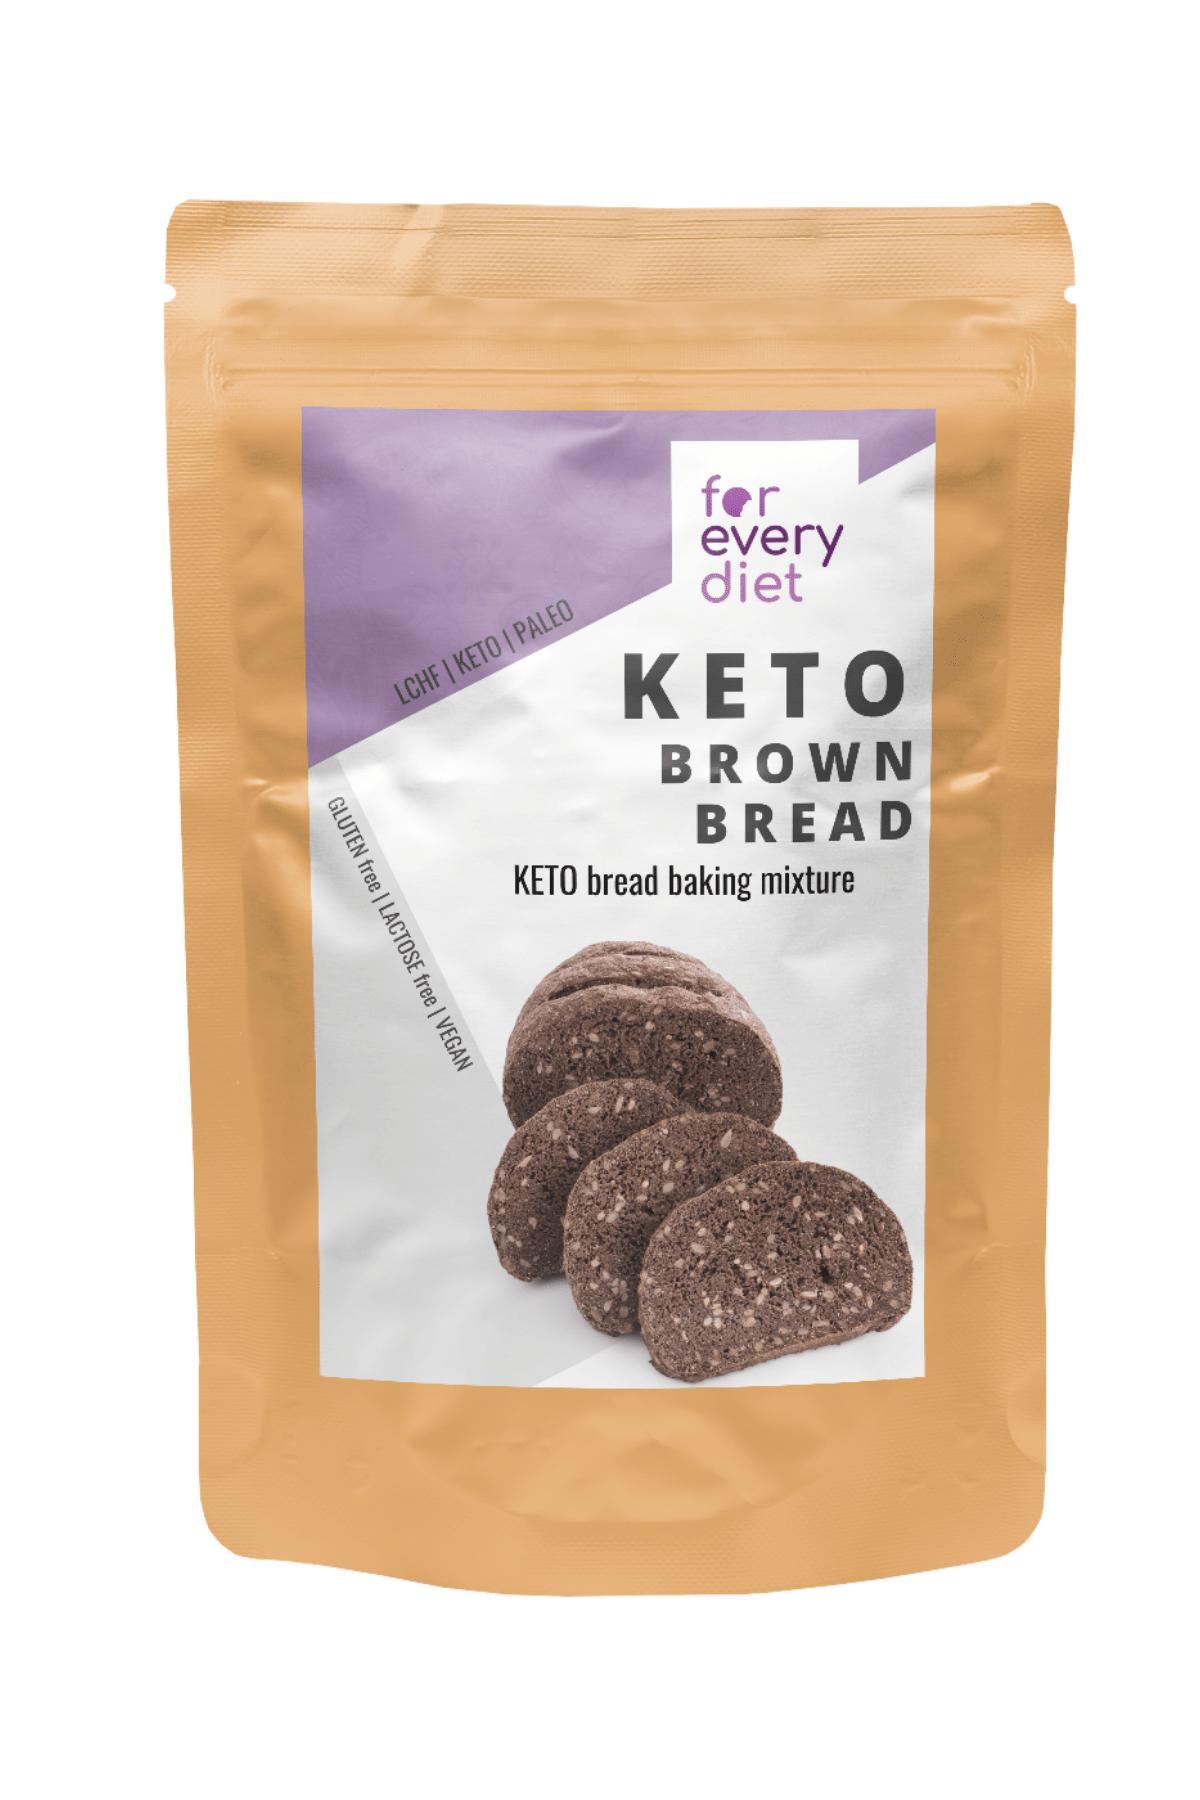 KETO brown bread baking mix